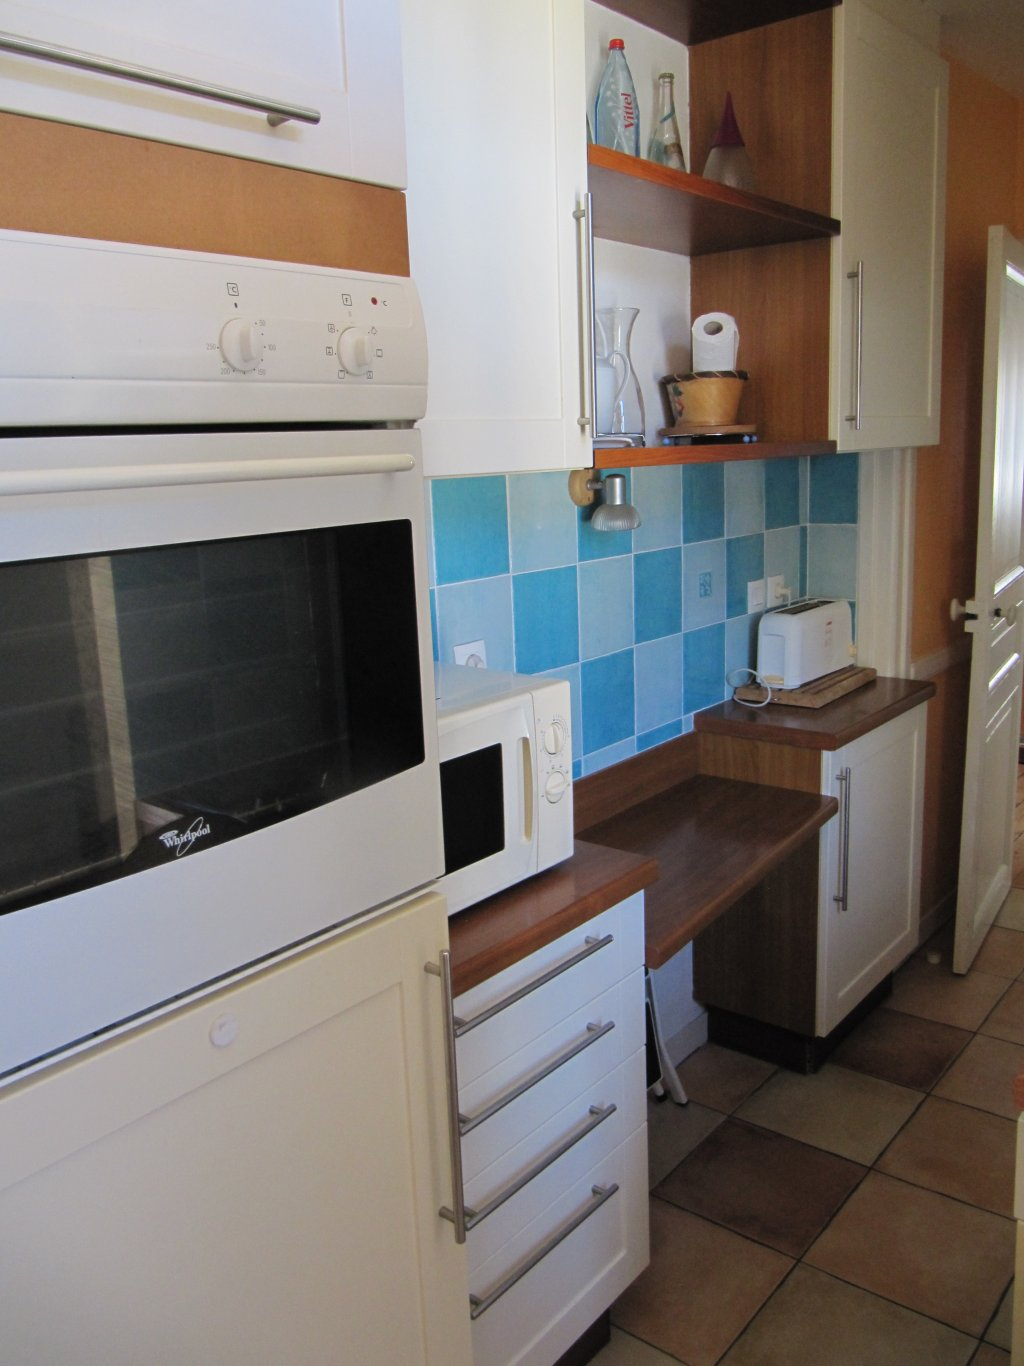 Appartement vacances dinard location 5 personnes sylviane for Tres belle cuisine equipee